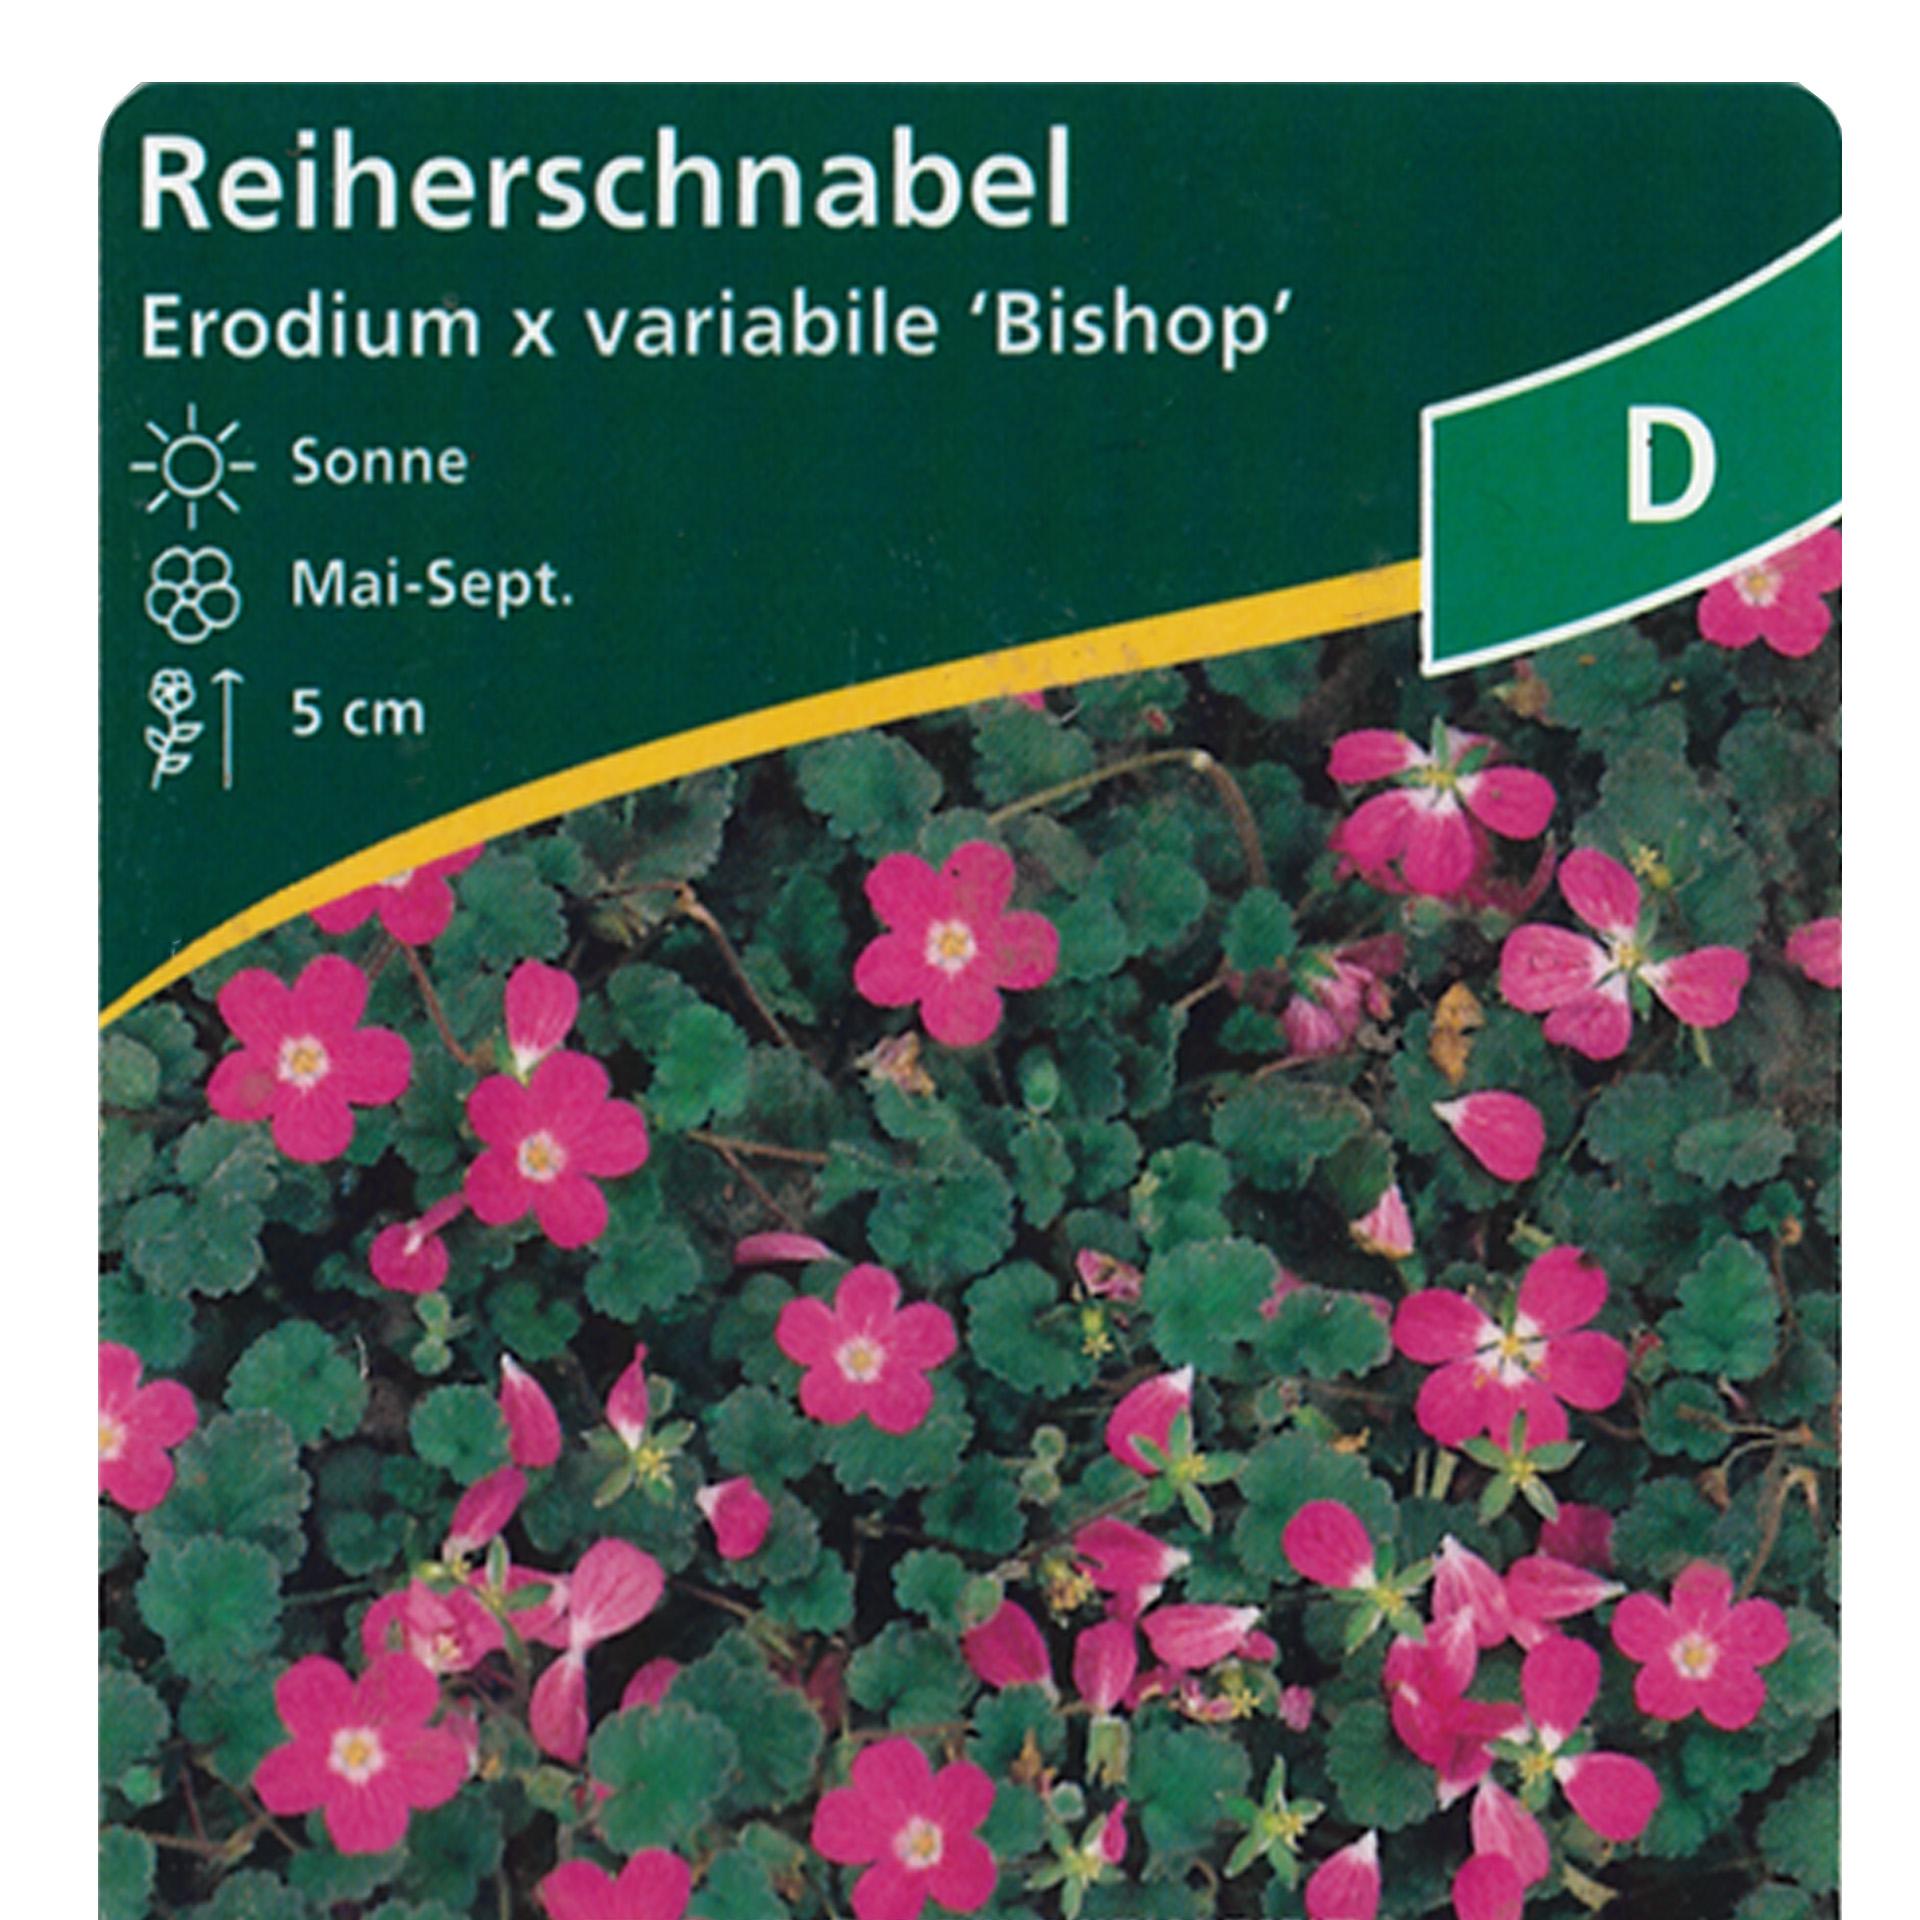 Reiherschnabel - Erodium variabile 'Bishop', 9cm Topf